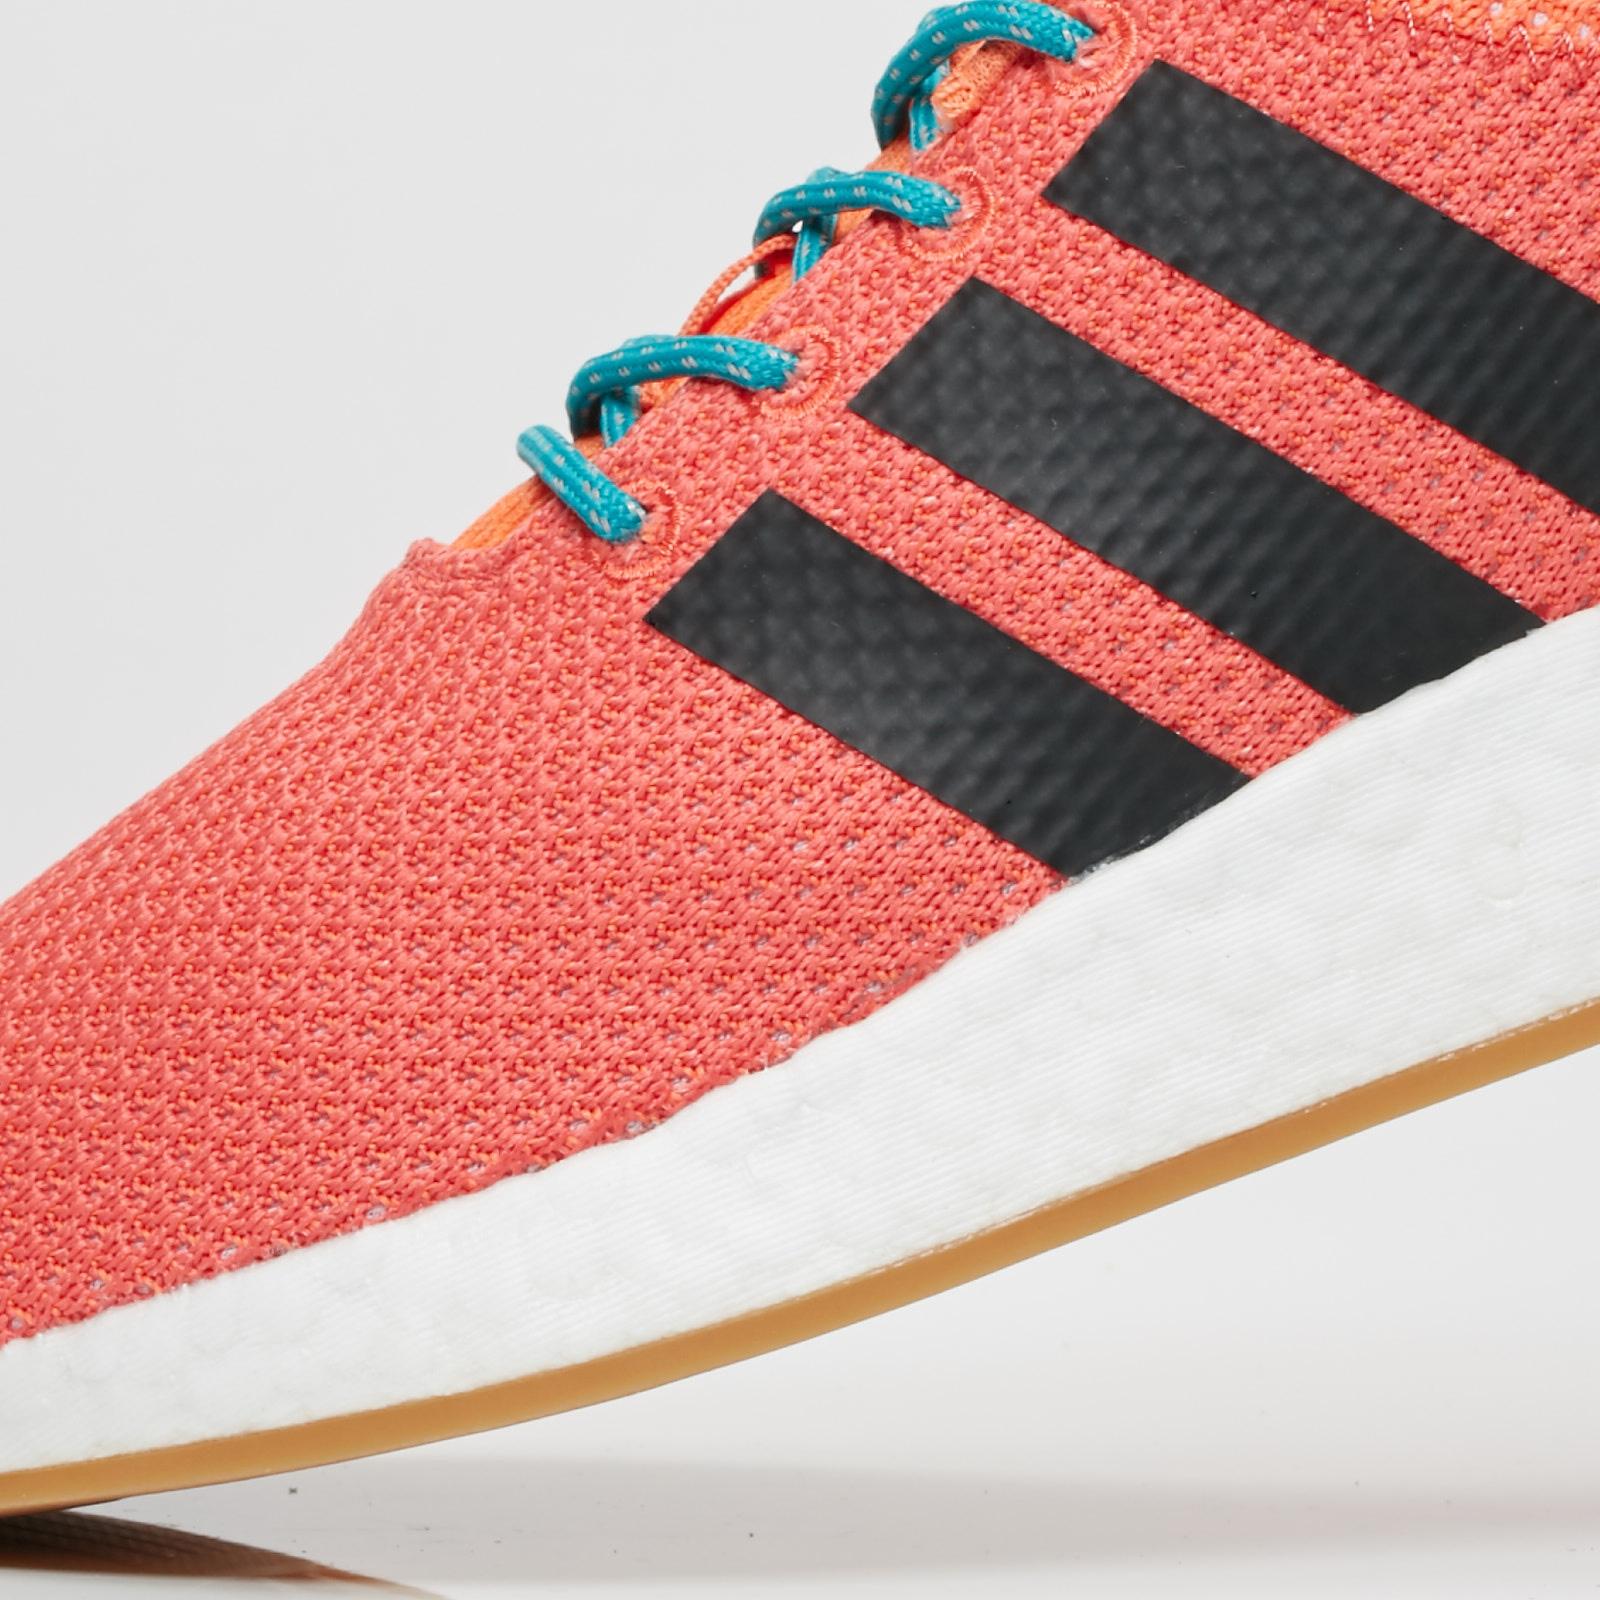 bad4e0e84 adidas NMD R2 Summer - Cq3081 - Sneakersnstuff